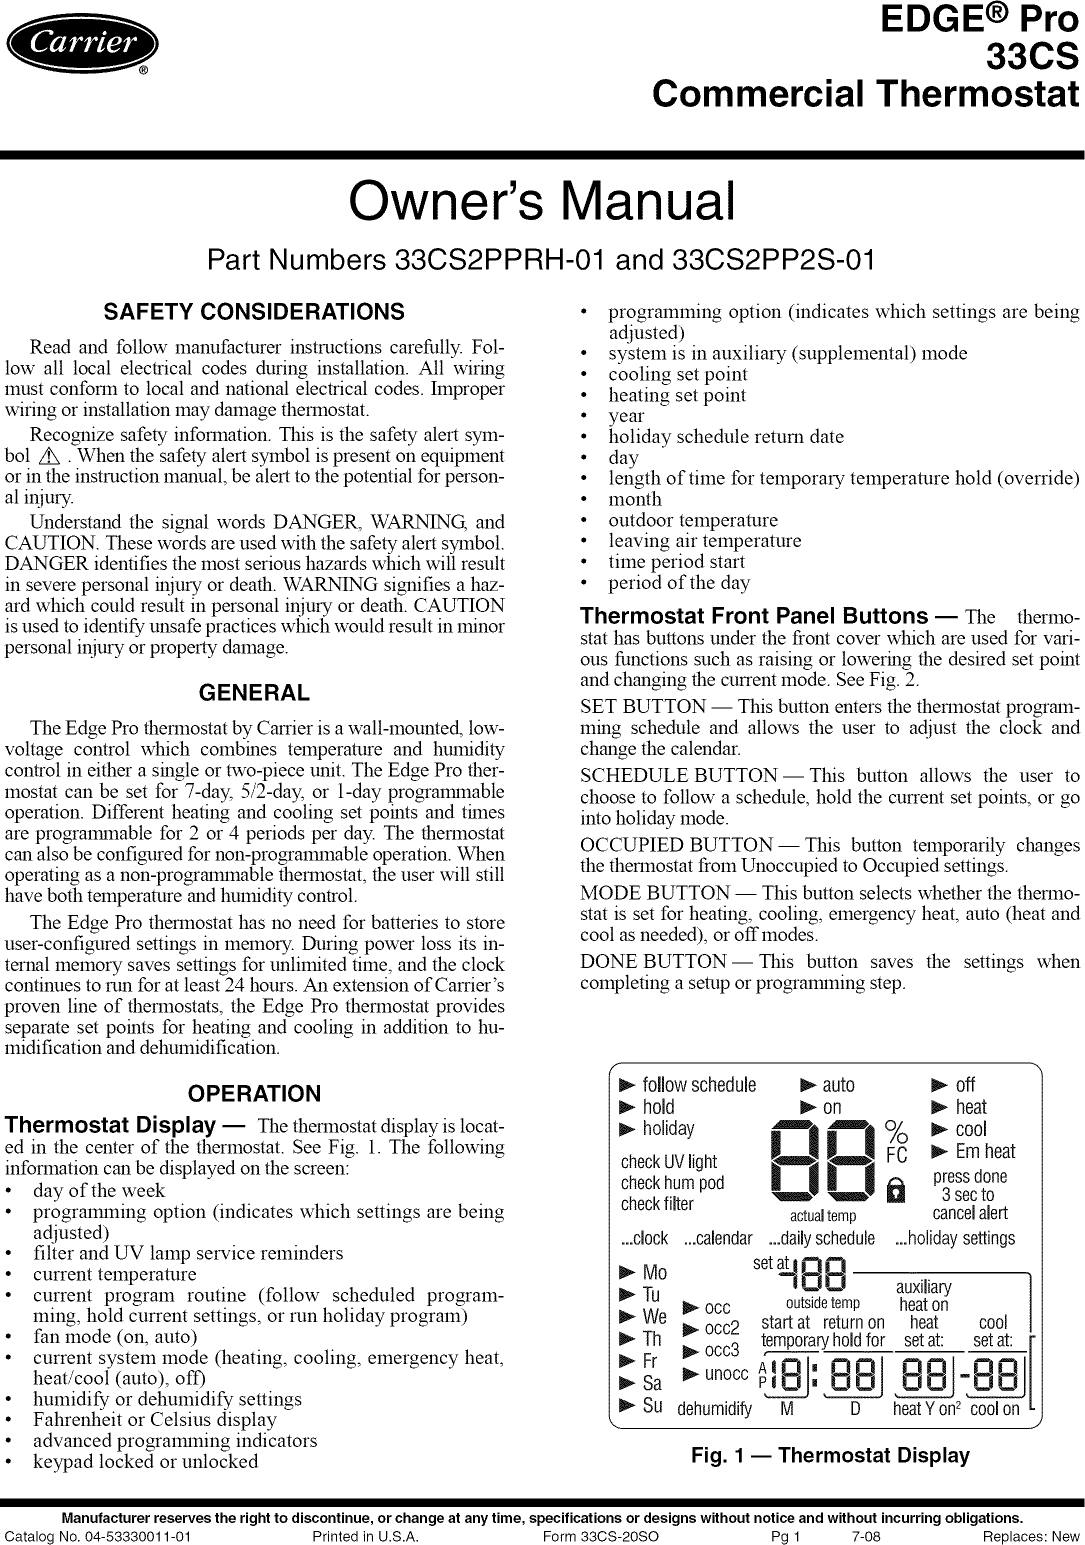 Carrier Edge Pro 33cs Users Manual